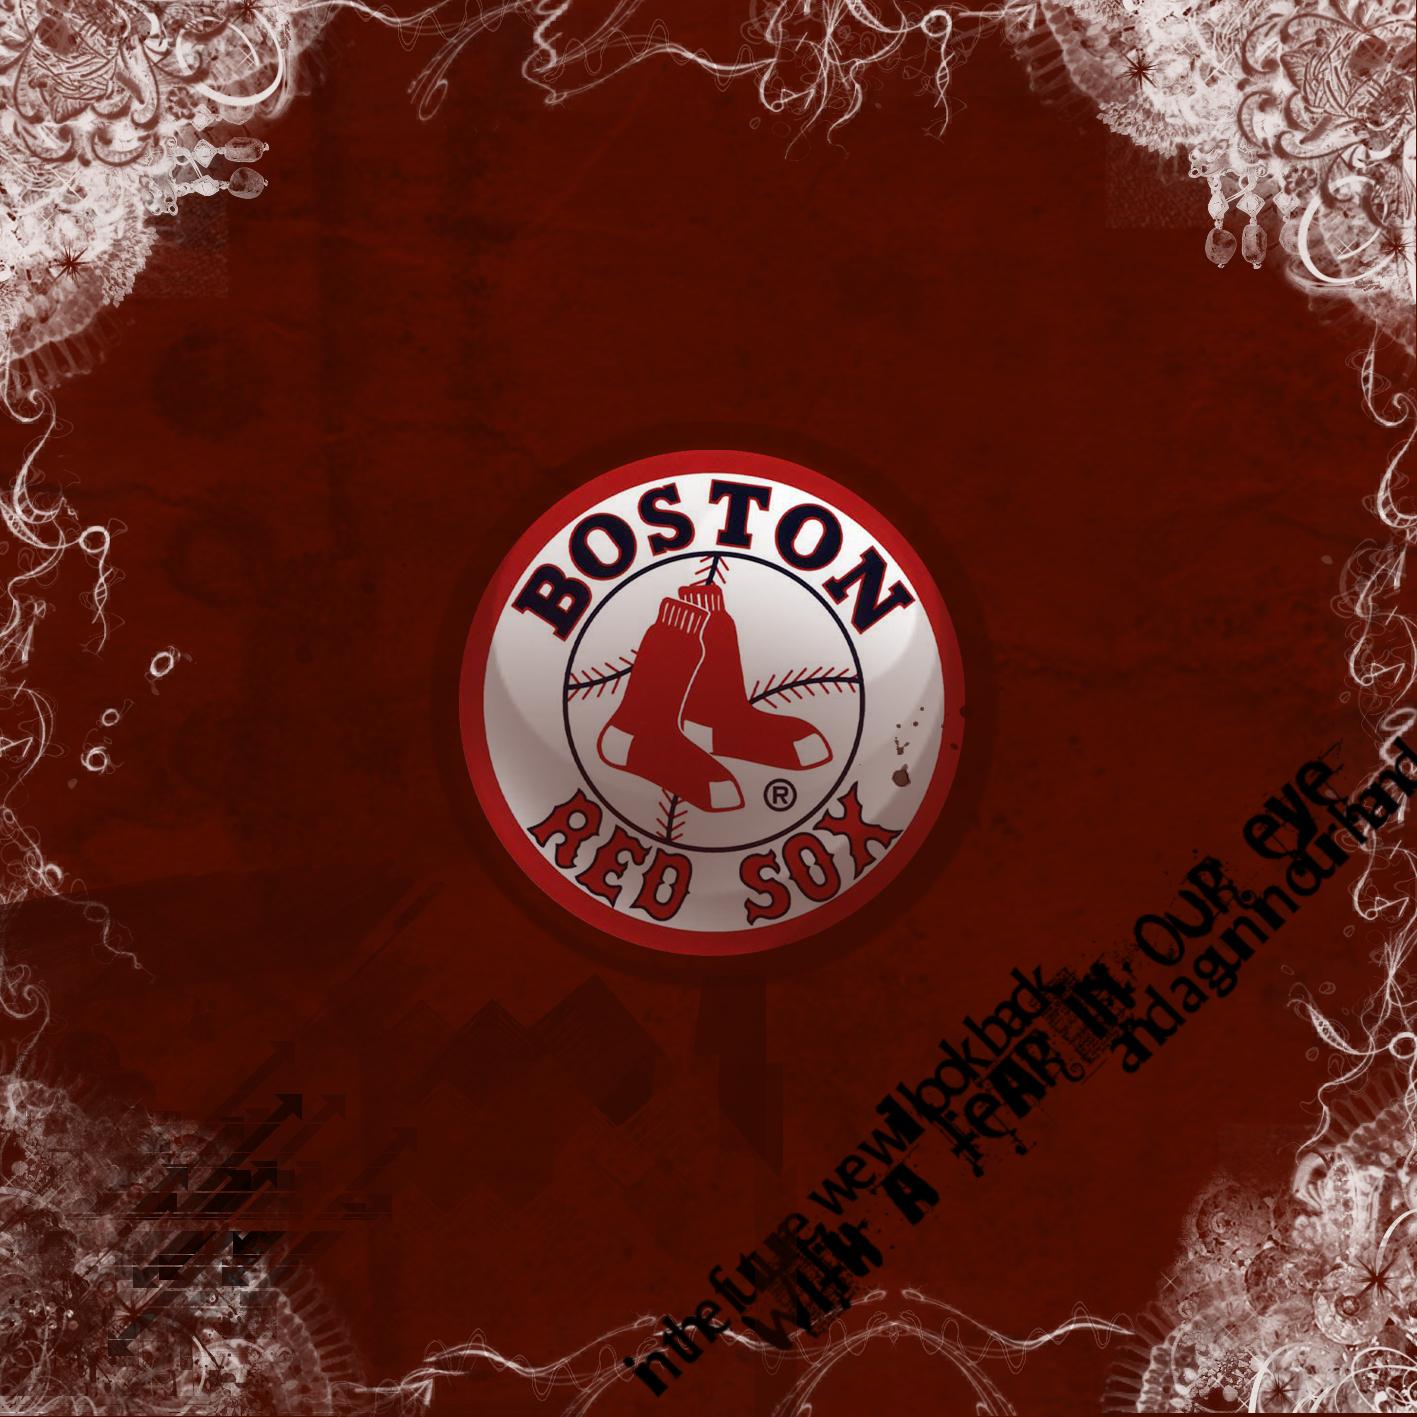 Boston Red Sox Wallpaper 18   1417 X 1417 stmednet 1417x1417